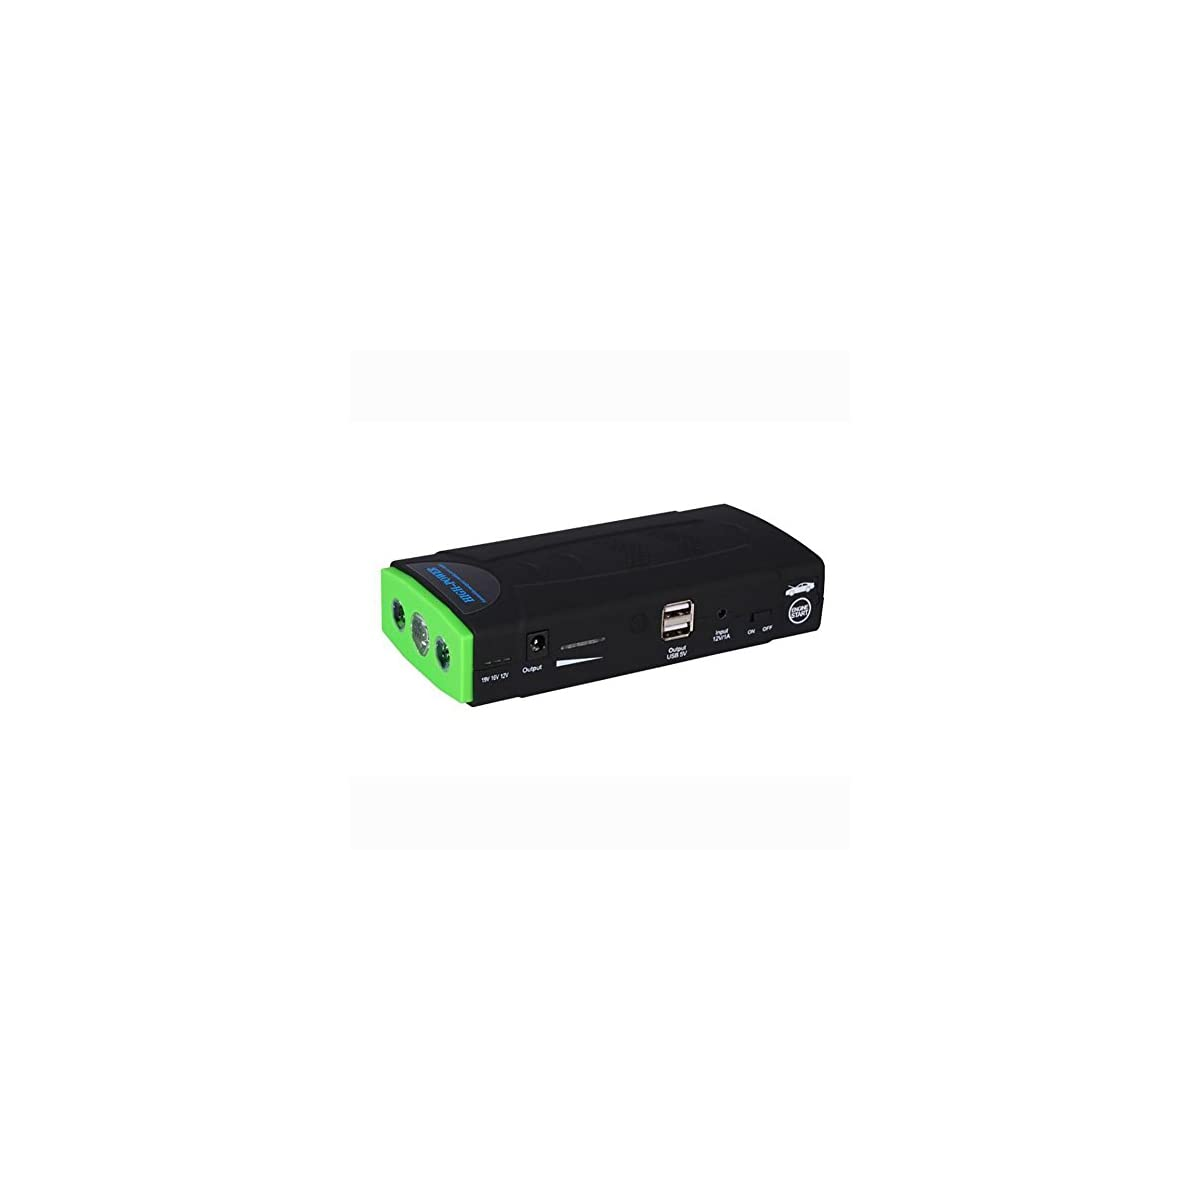 41kUXZs87eL. SS1200  - MIAO Auto Jump Starter - Fuente de alimentación de arranque de emergencia para automóvil multipropósito de 12V, 68800mAh 3.0L Coche de gasolina y 2.0L para automóvil diesel Linterna de LED universal Banco de alimentación / alimentación móvil